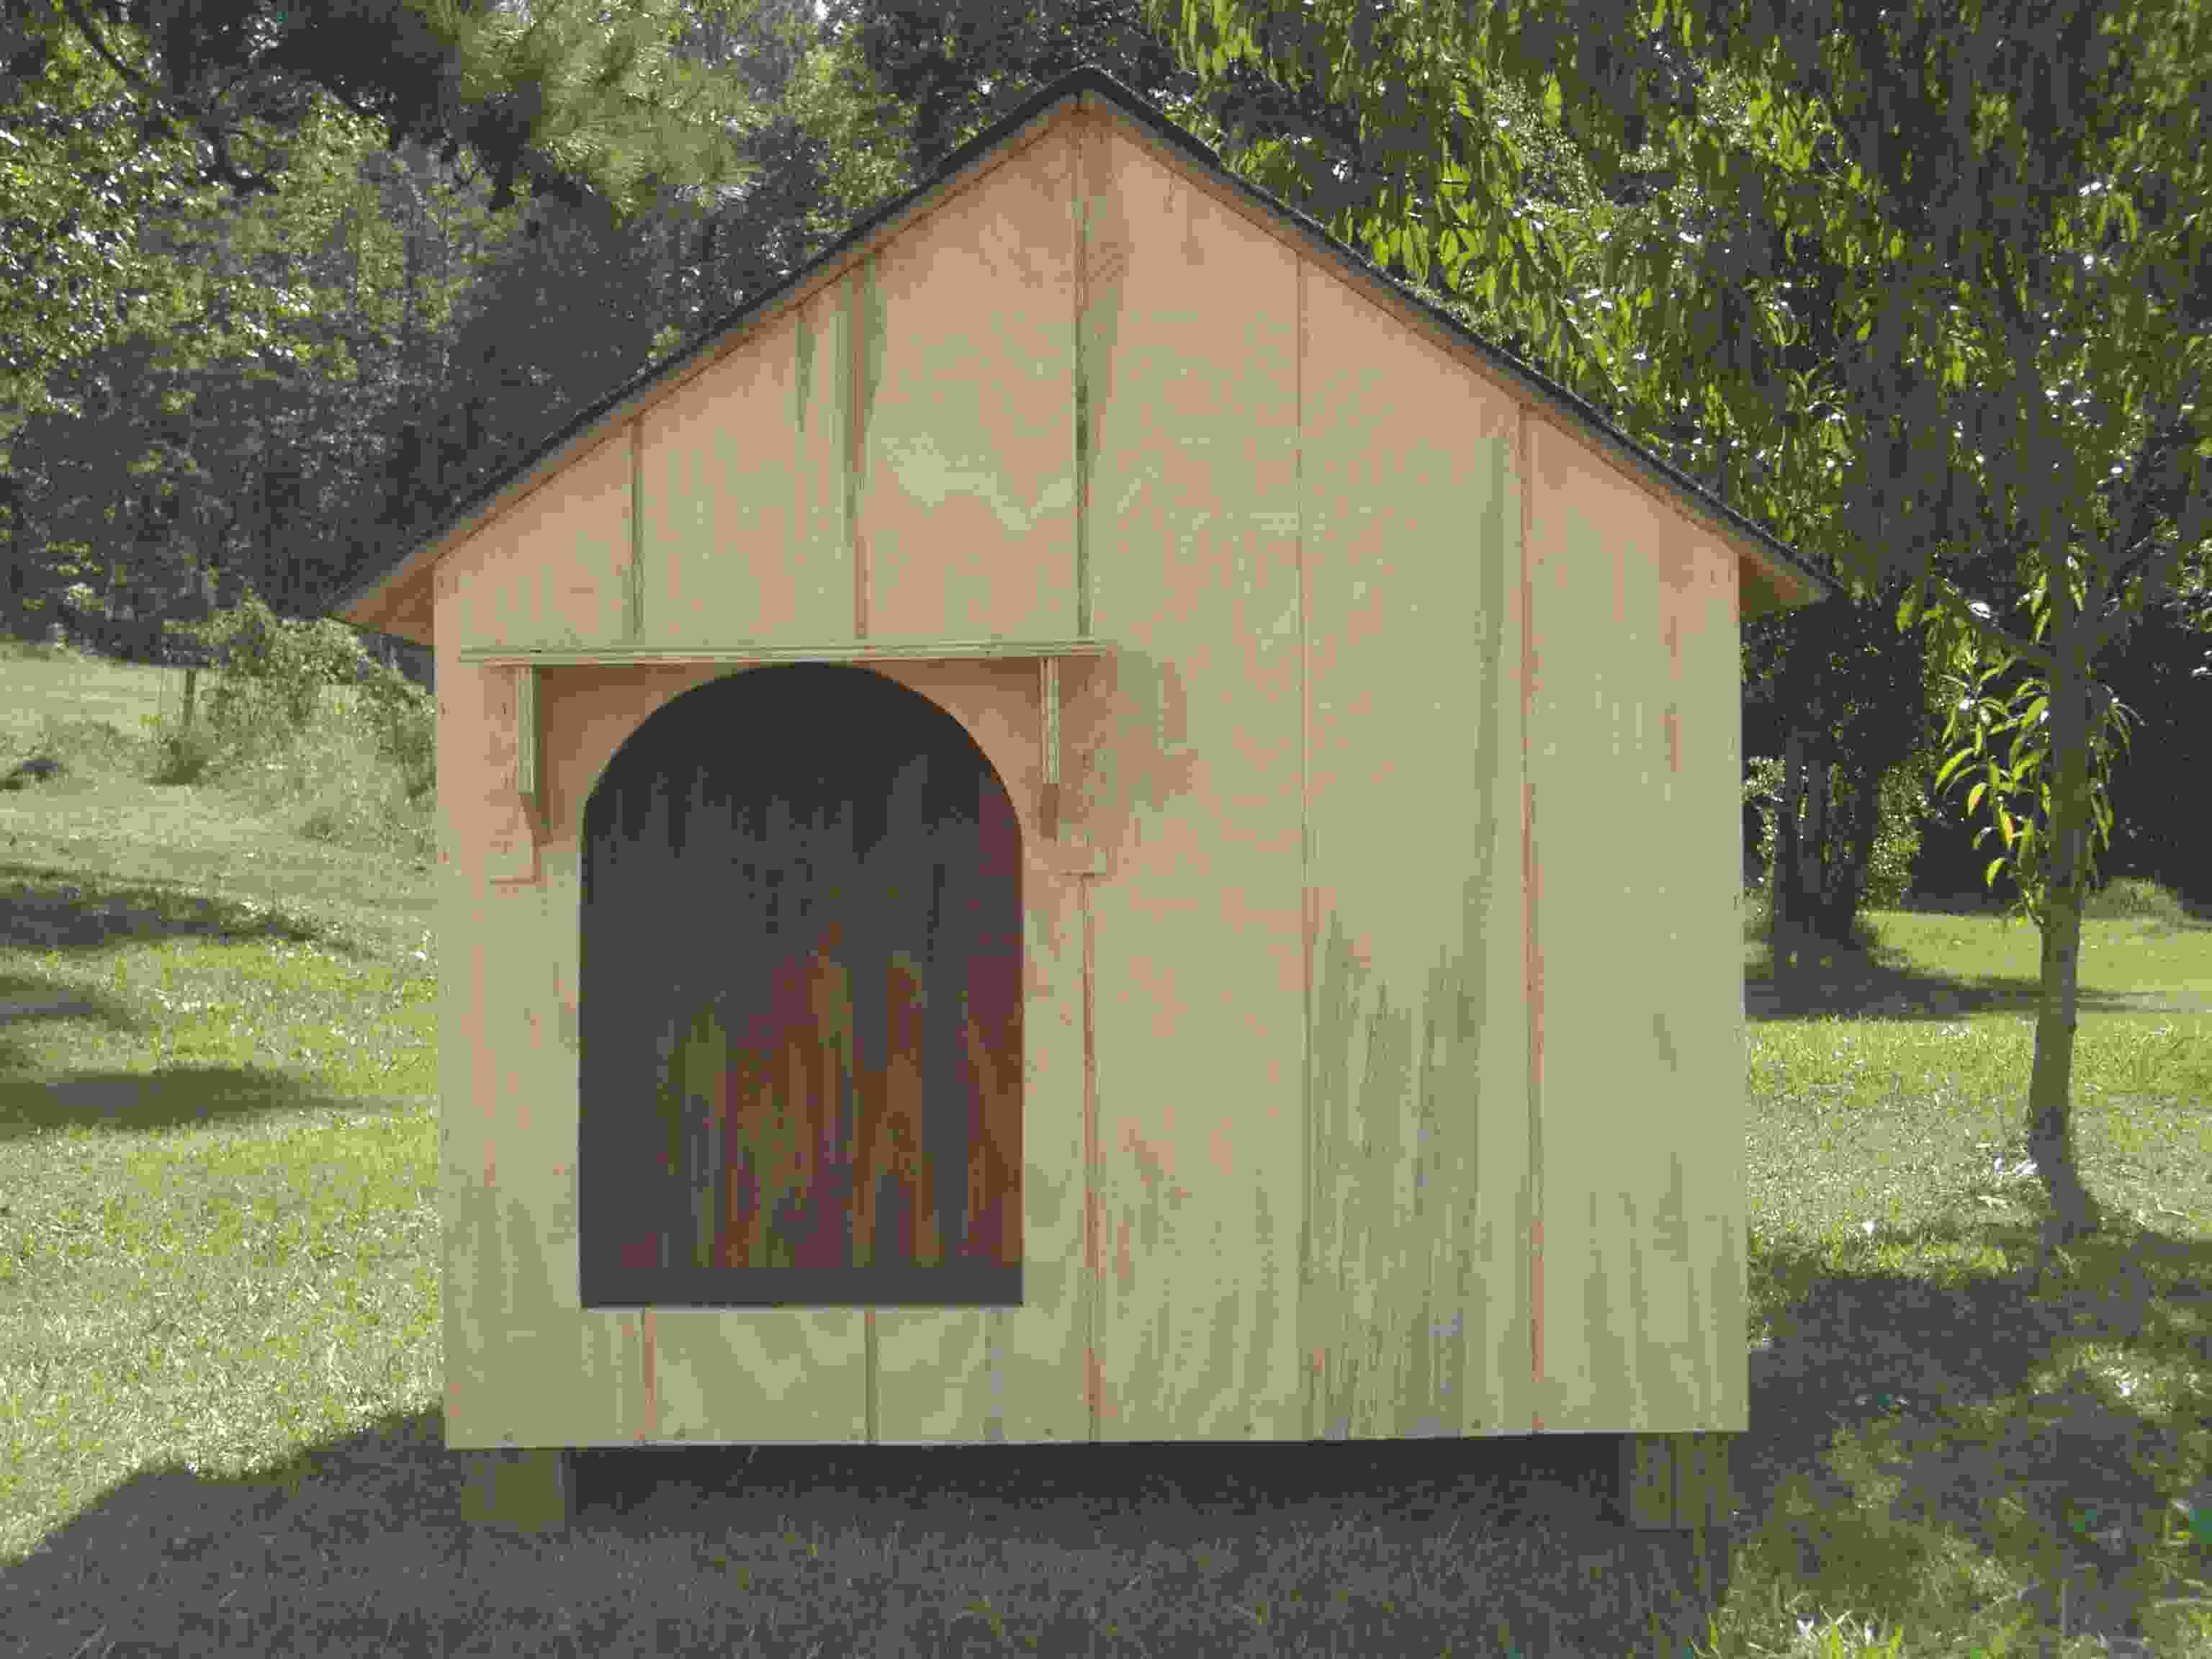 xxl dog house for sale